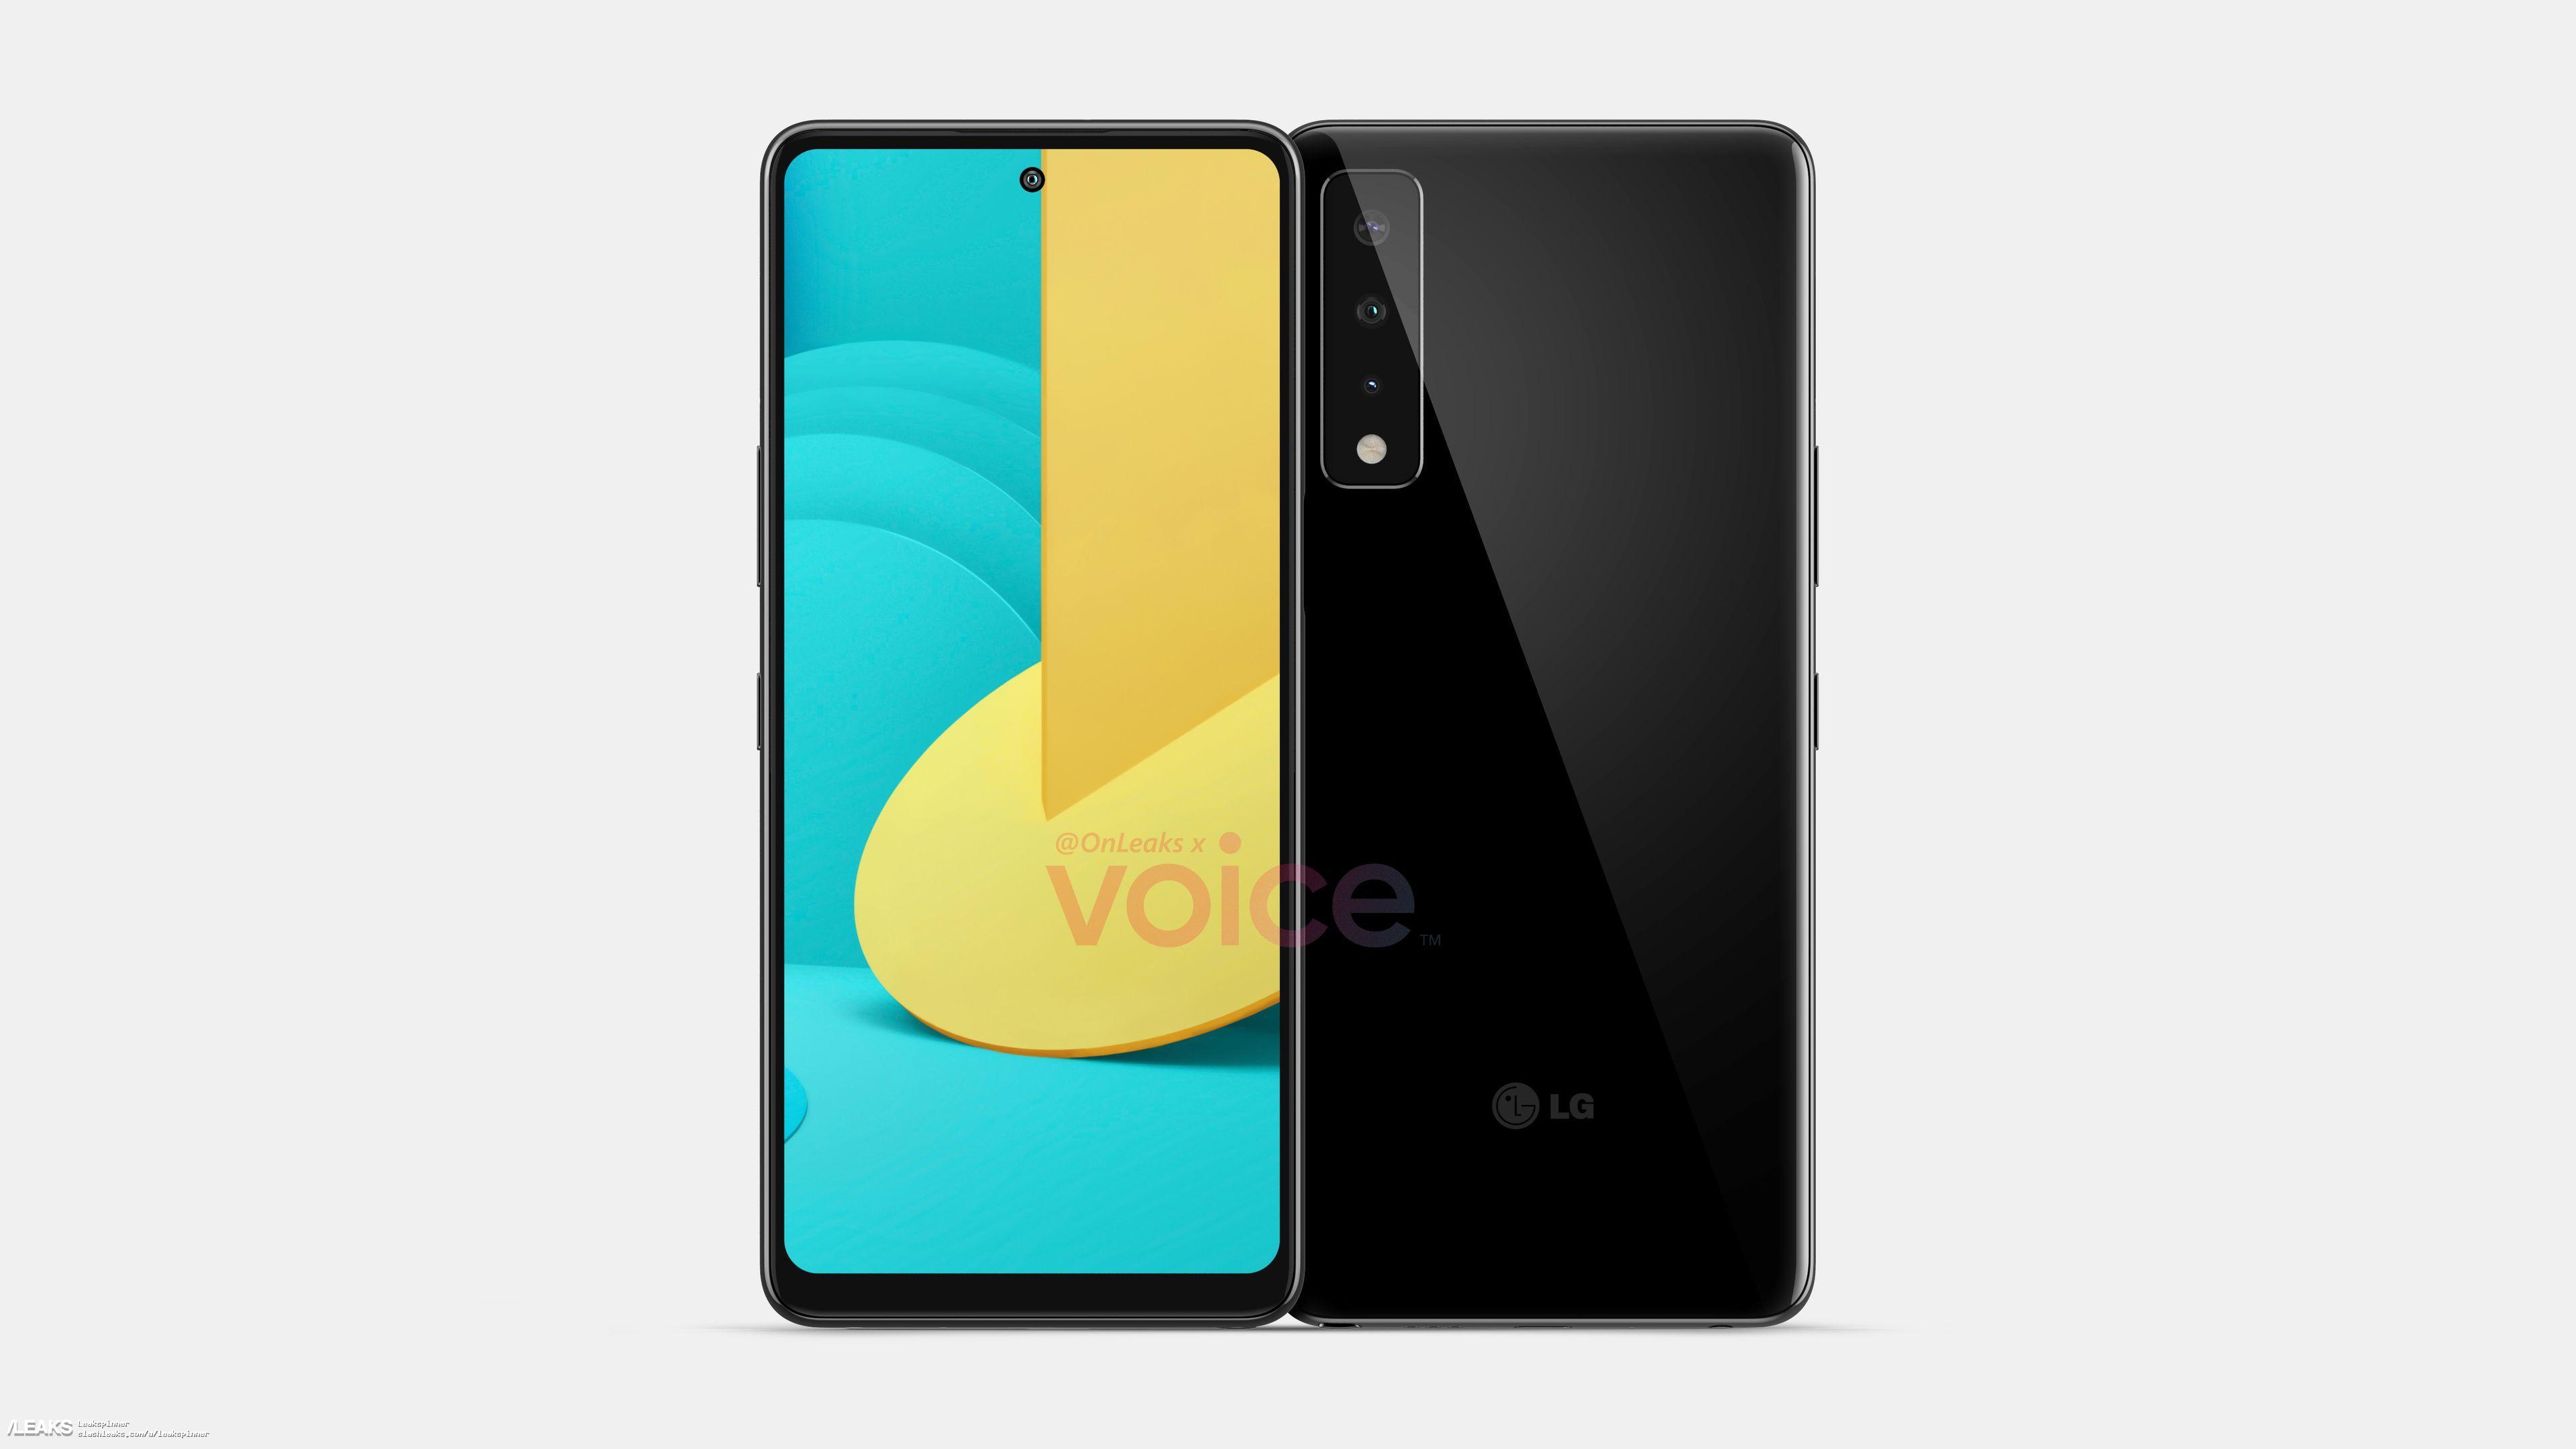 img LG Stylo 7 5G renders and dimensions leaked by @OnLeaks